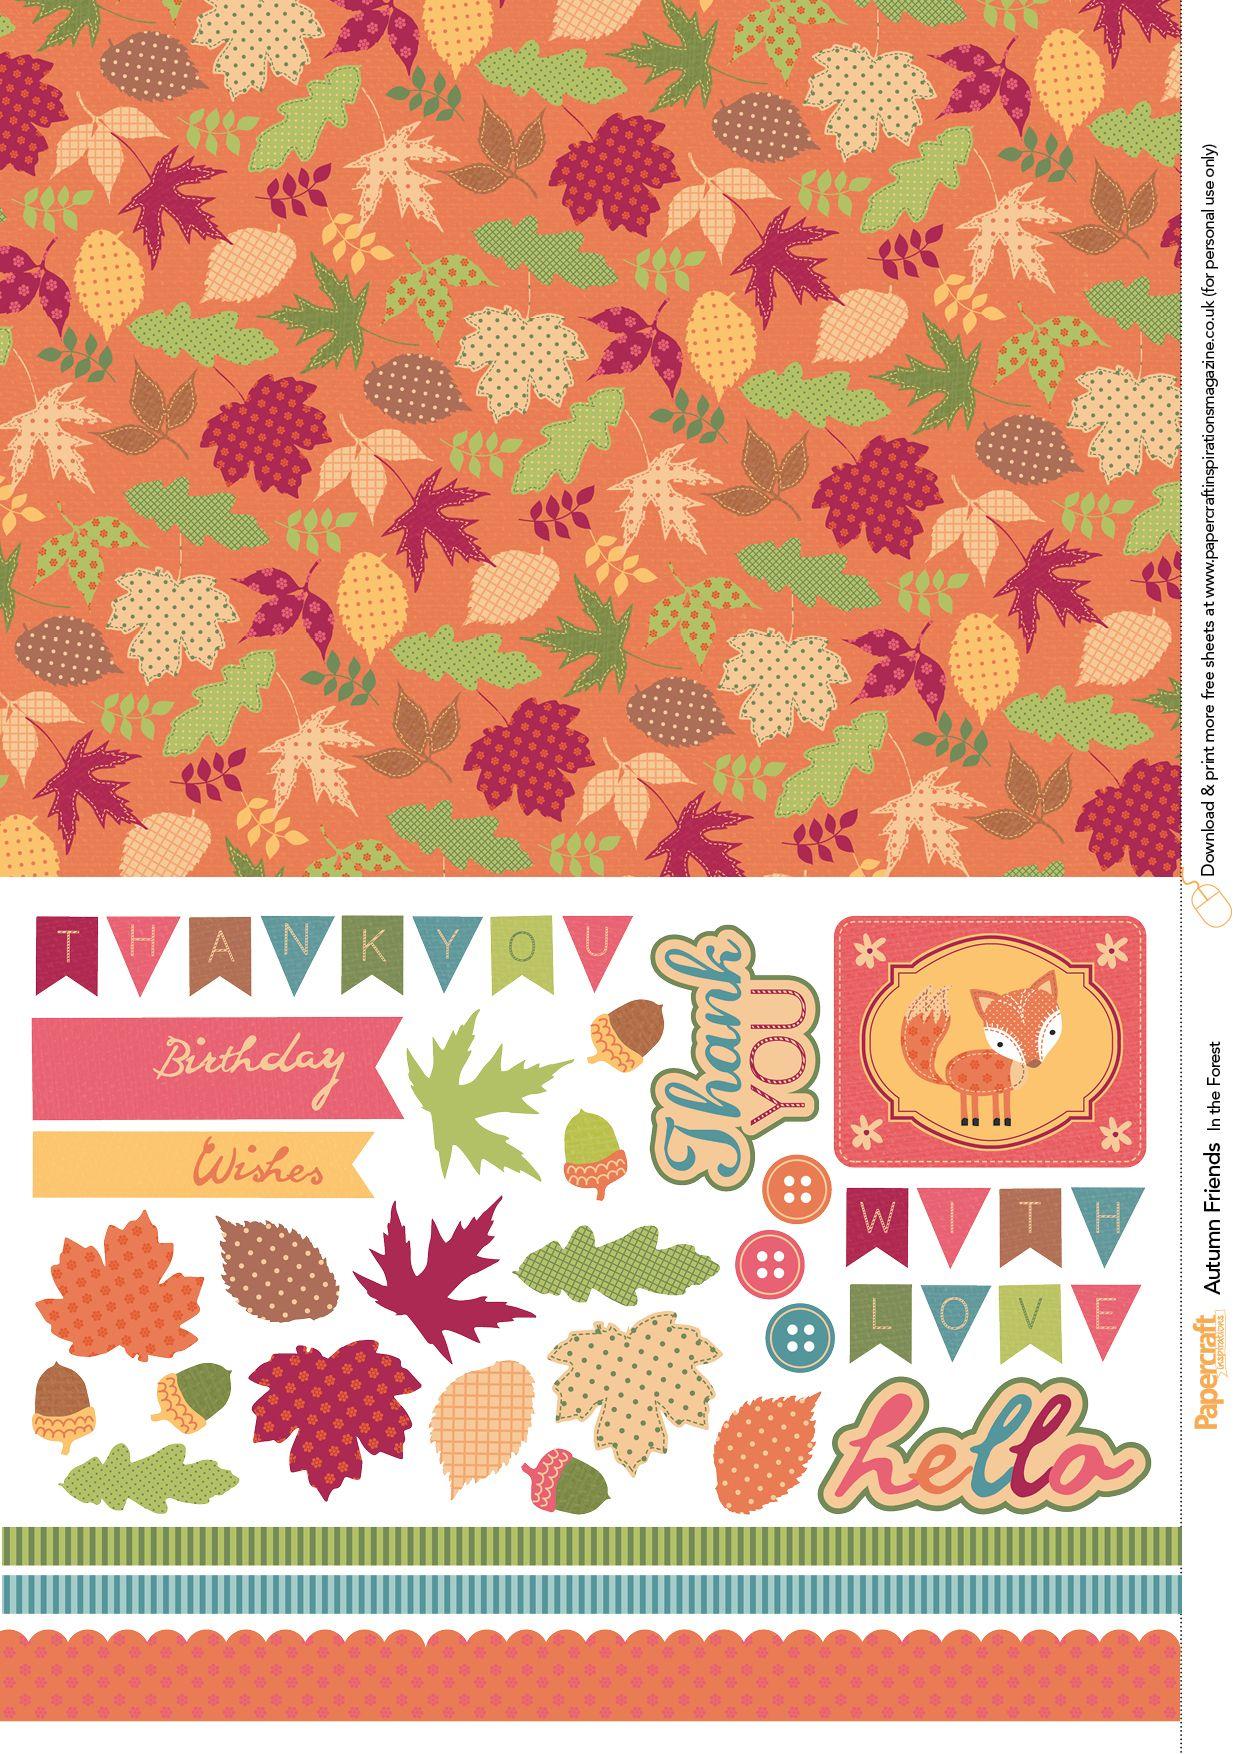 Free Autumnal Squirrel And Owl Printables Digital Scrapbook Paper Scrapbook Printing Paper Crafts